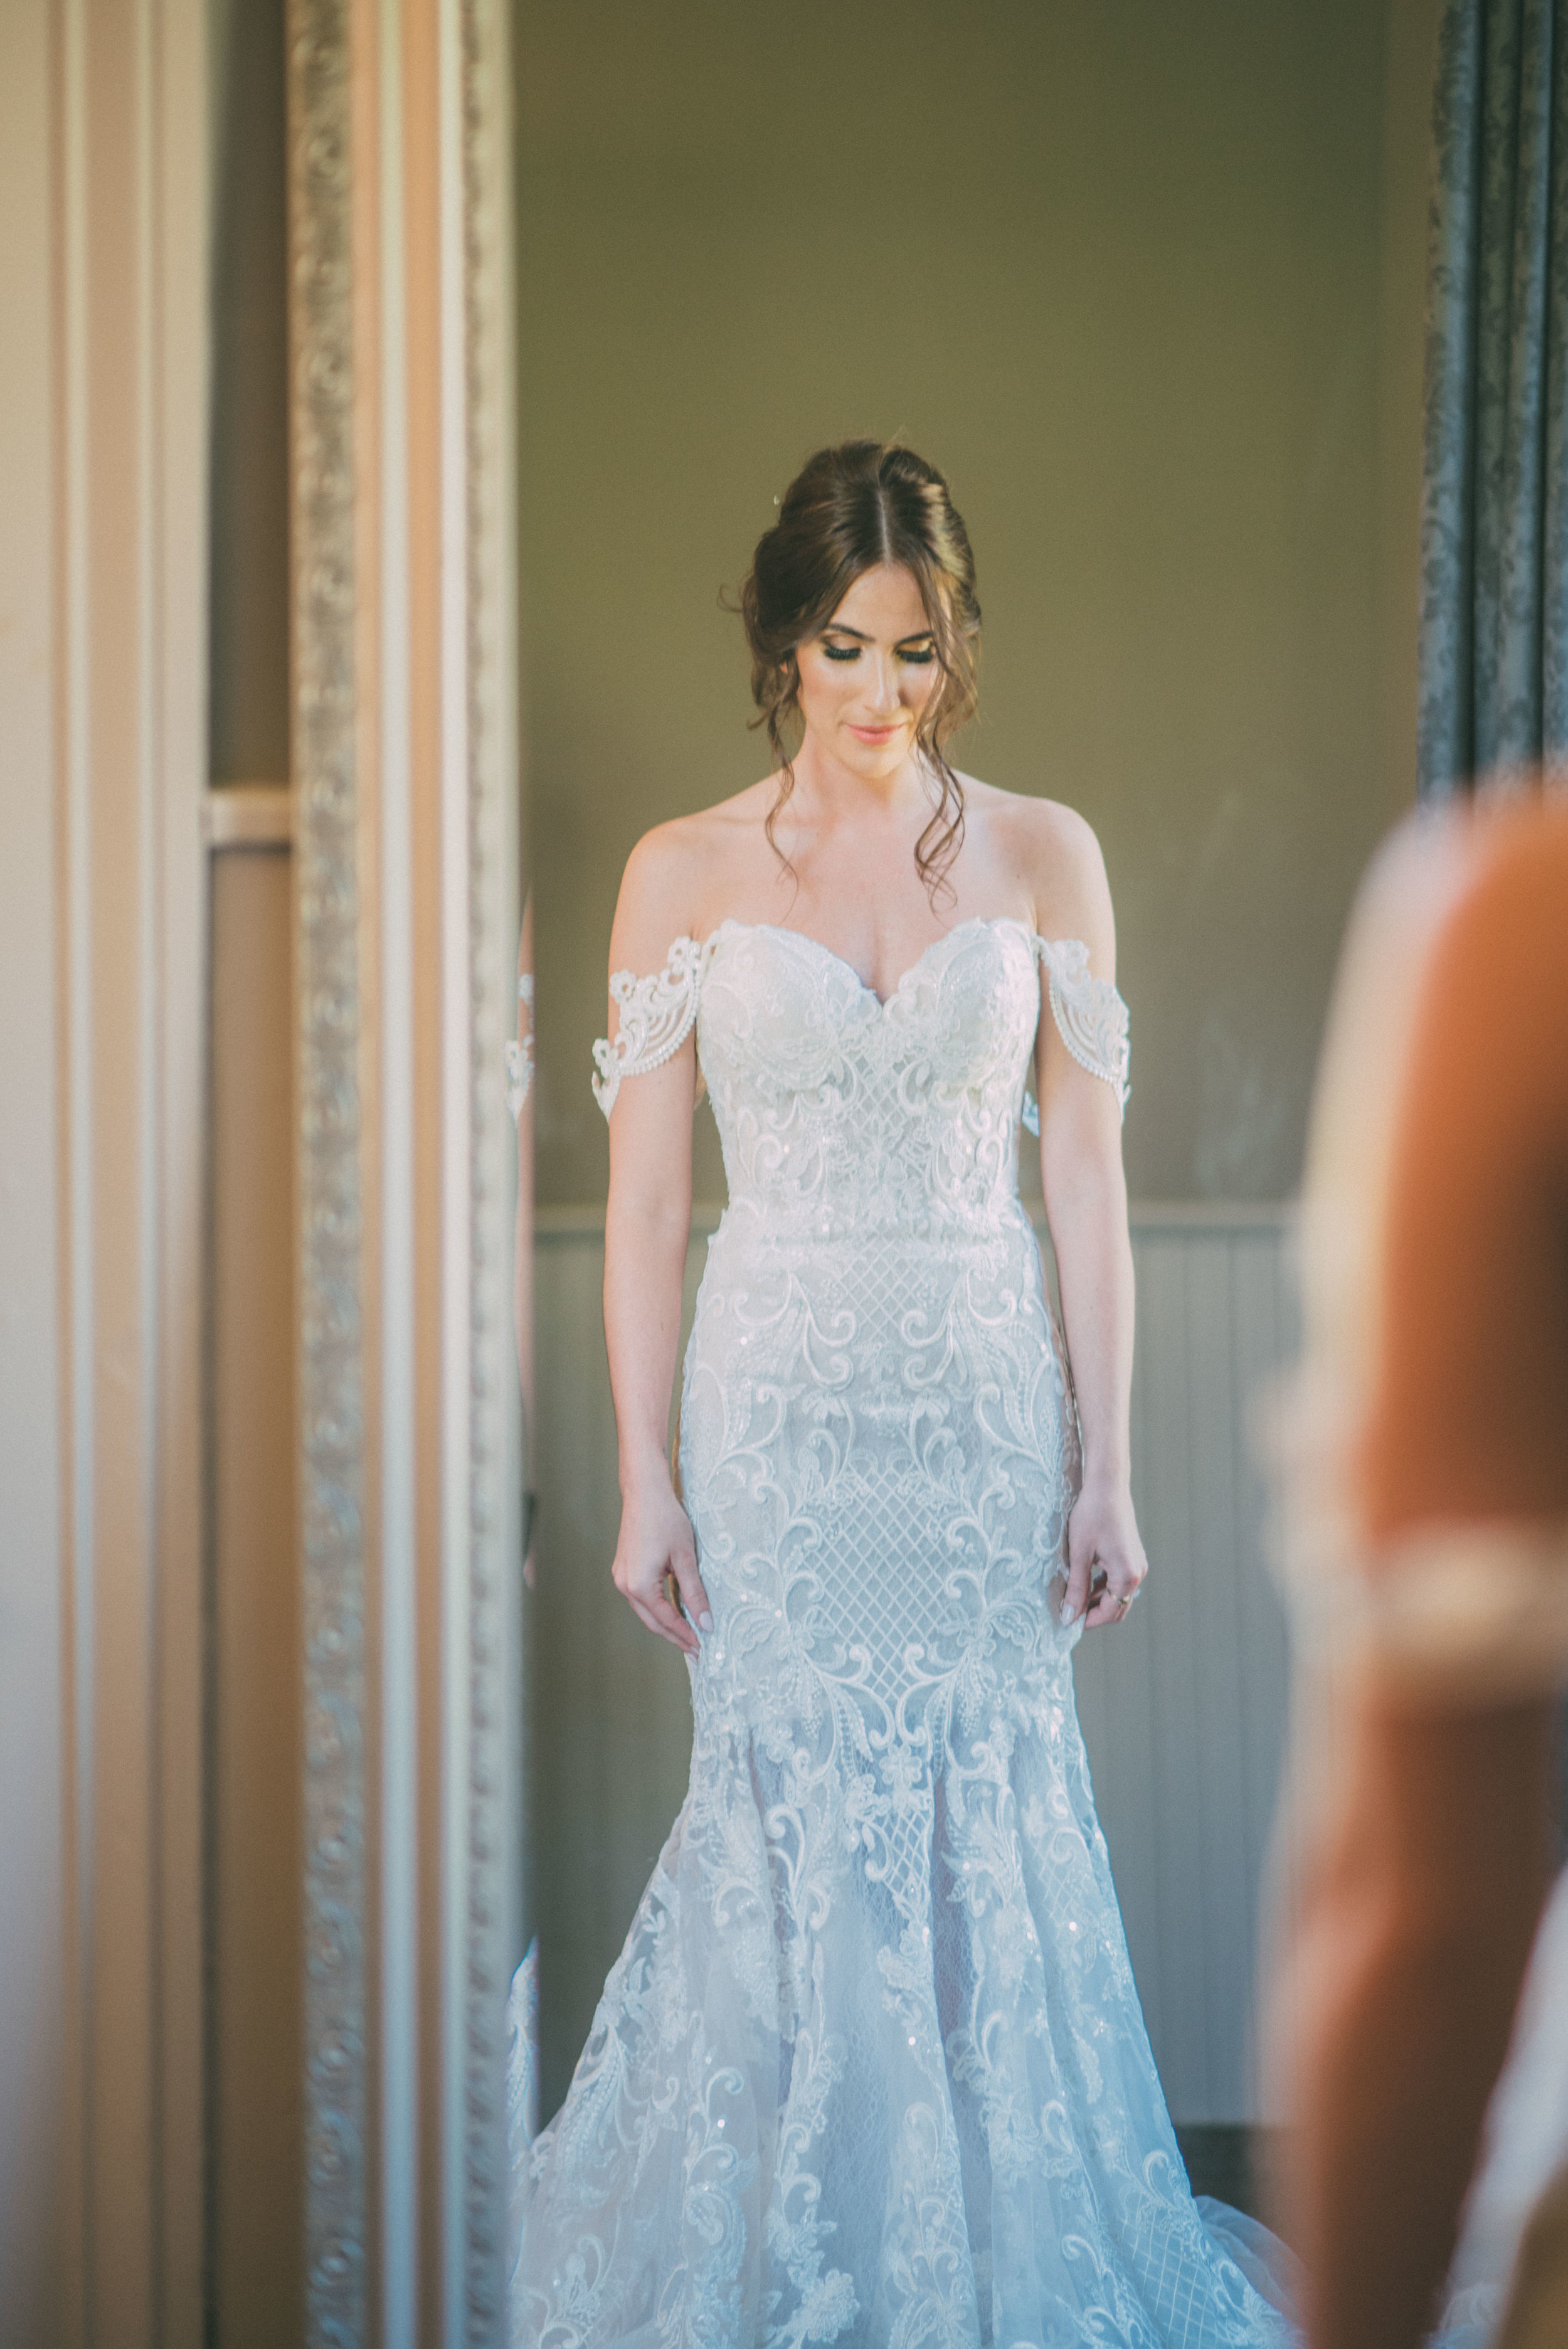 Hamilton wedding photographer, Balls Falls wedding photography with Soundslikeyellowphotography